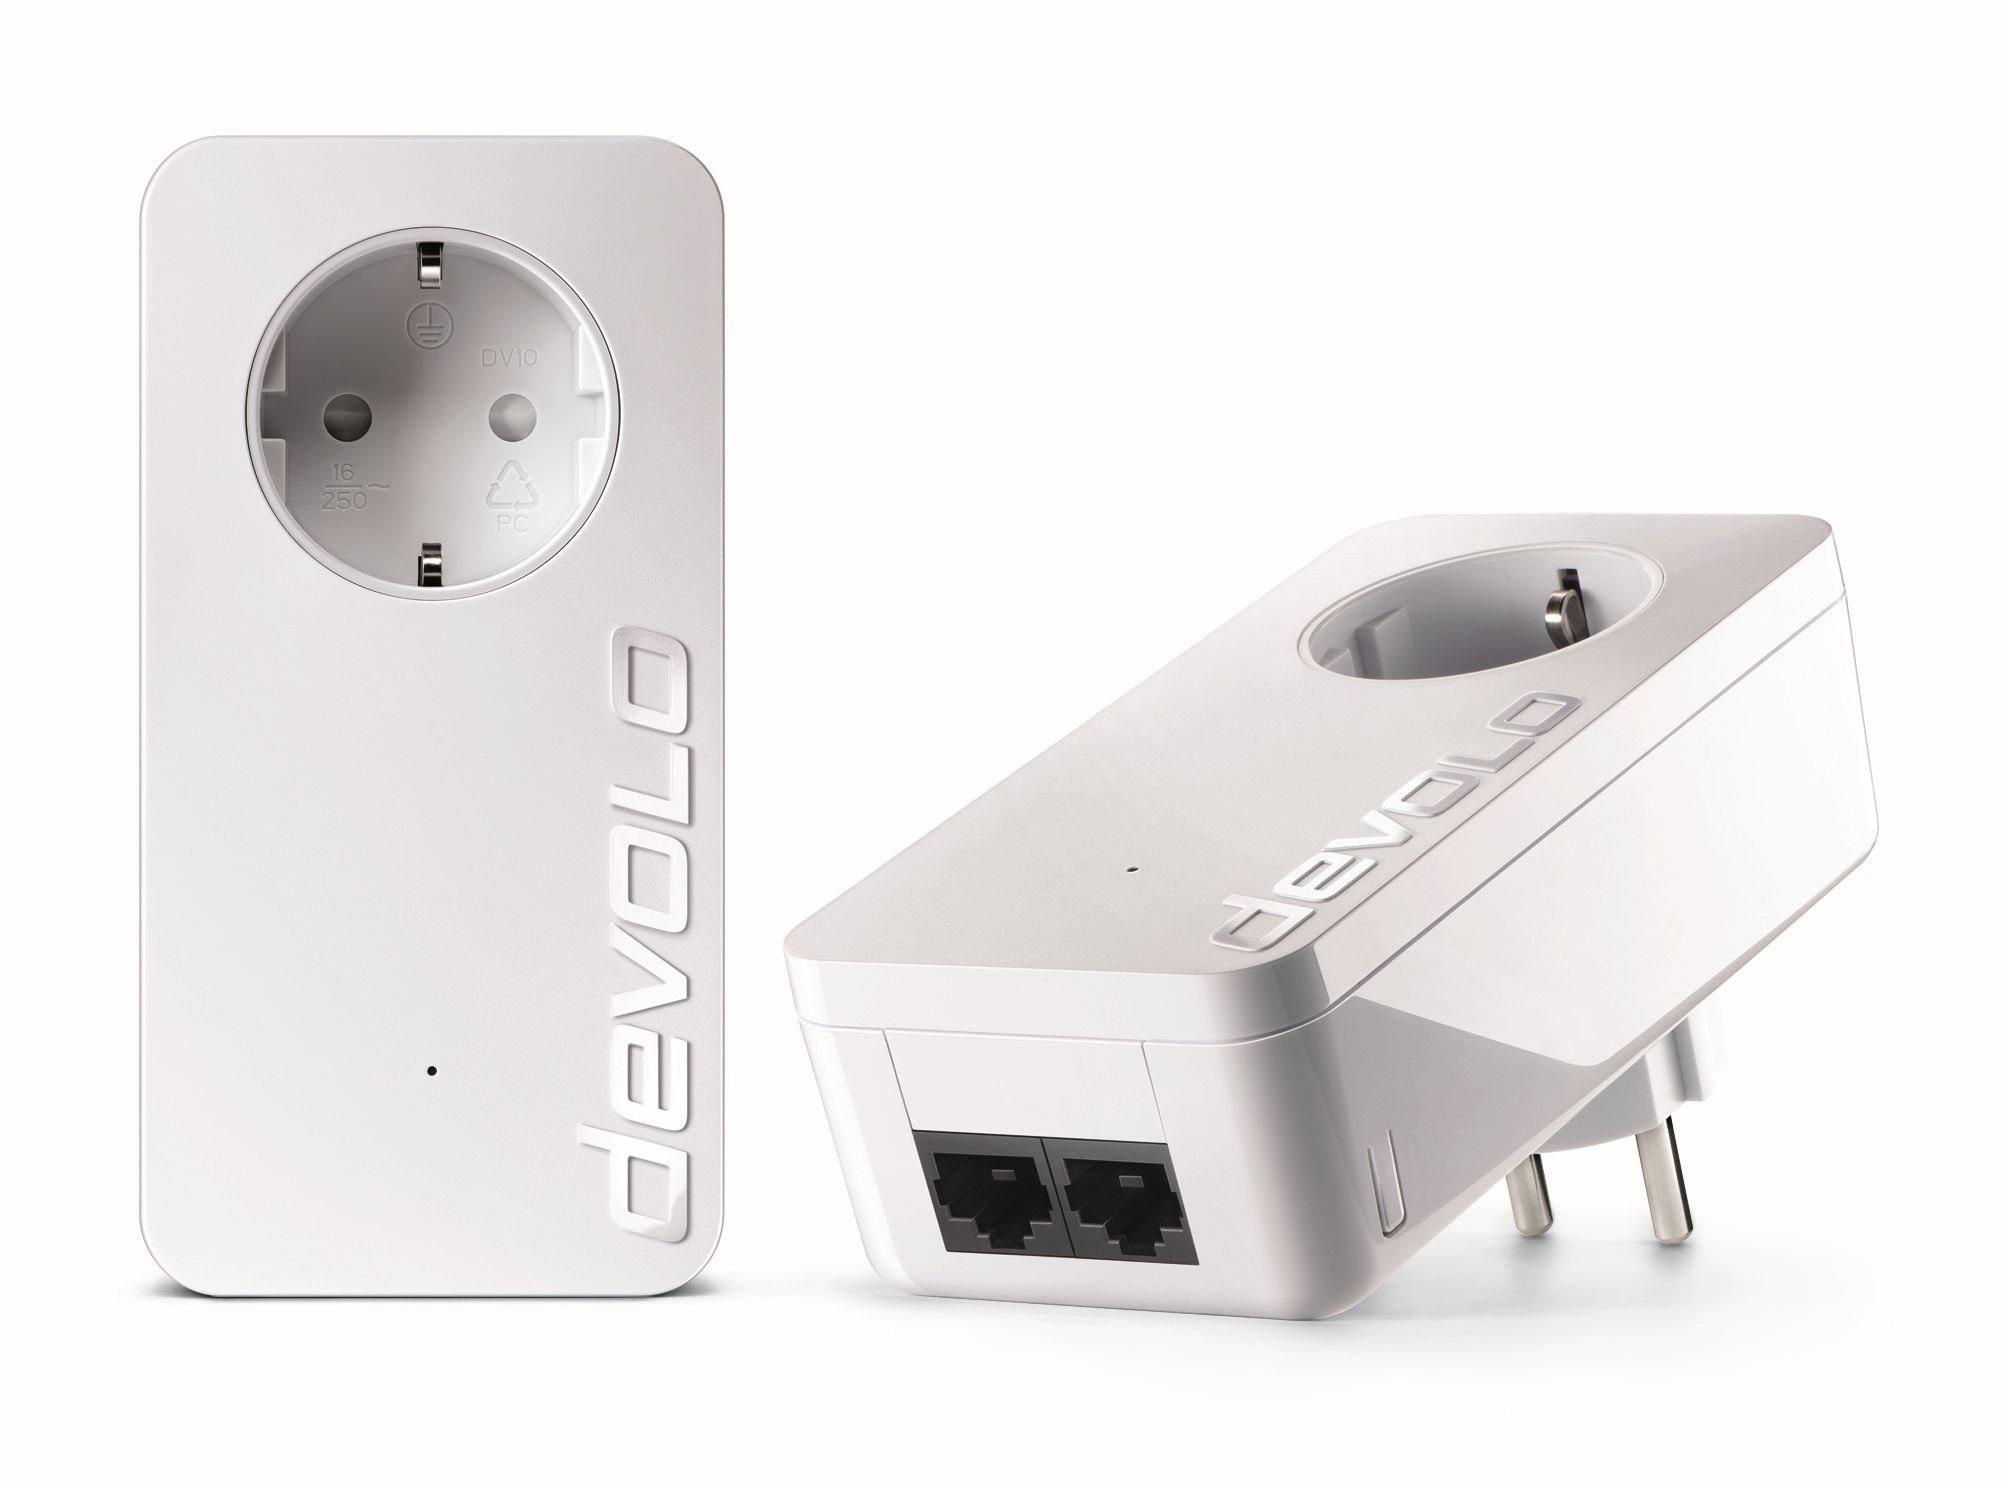 DEVOLO Powerline »dLAN 550 duo+ Kit (500Mbit, 2xLAN,Netzwerk,range+)«